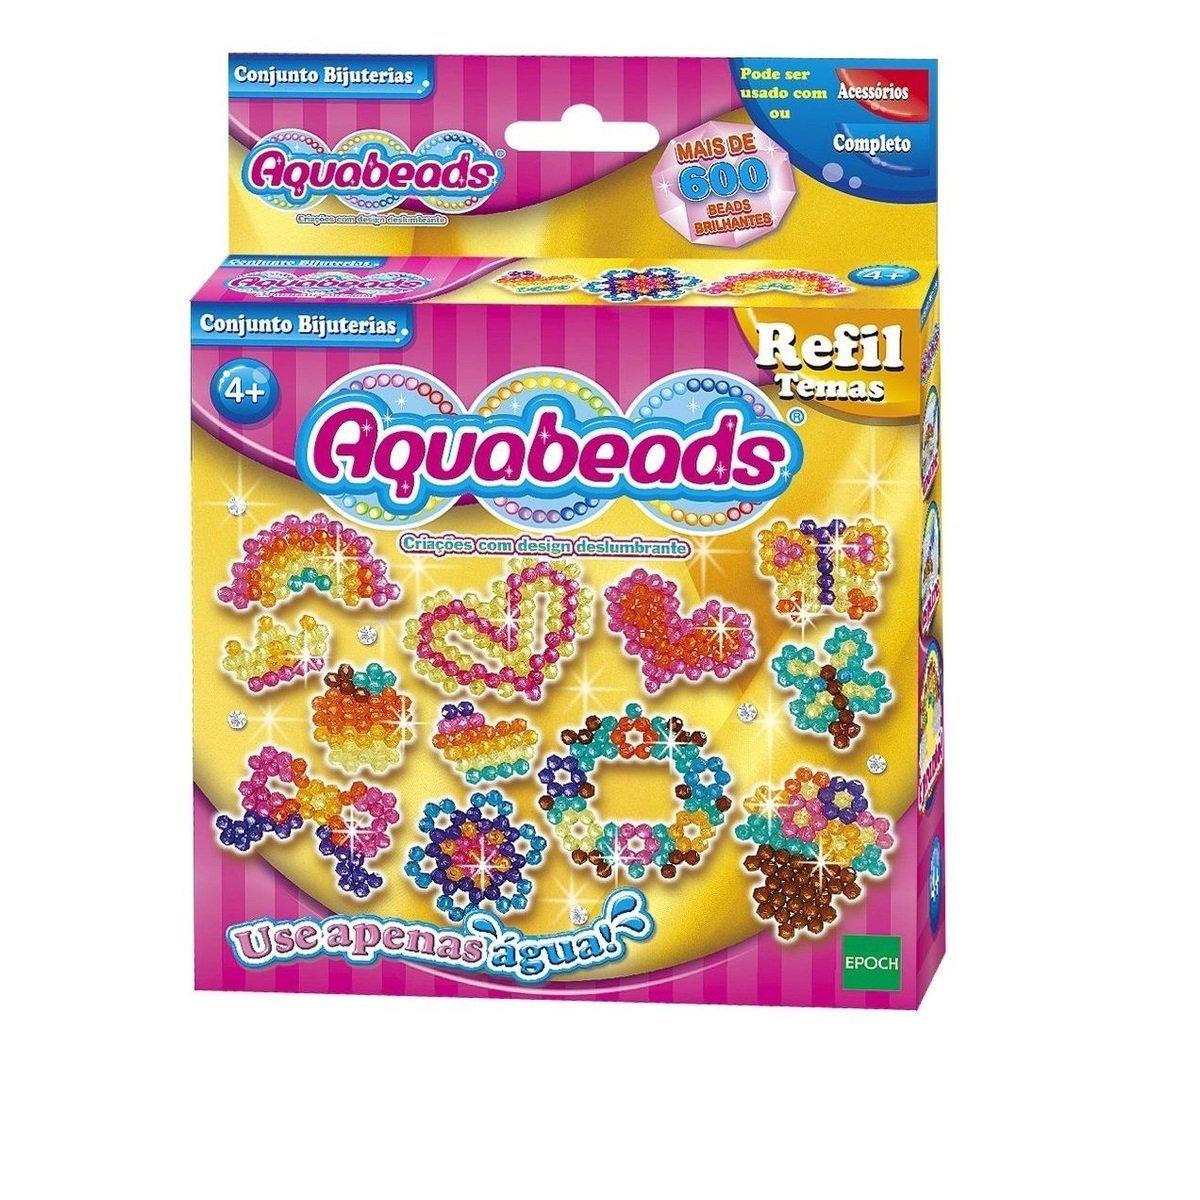 Conjunto Bijuterias Refil Aquabeads - Epoch 30658